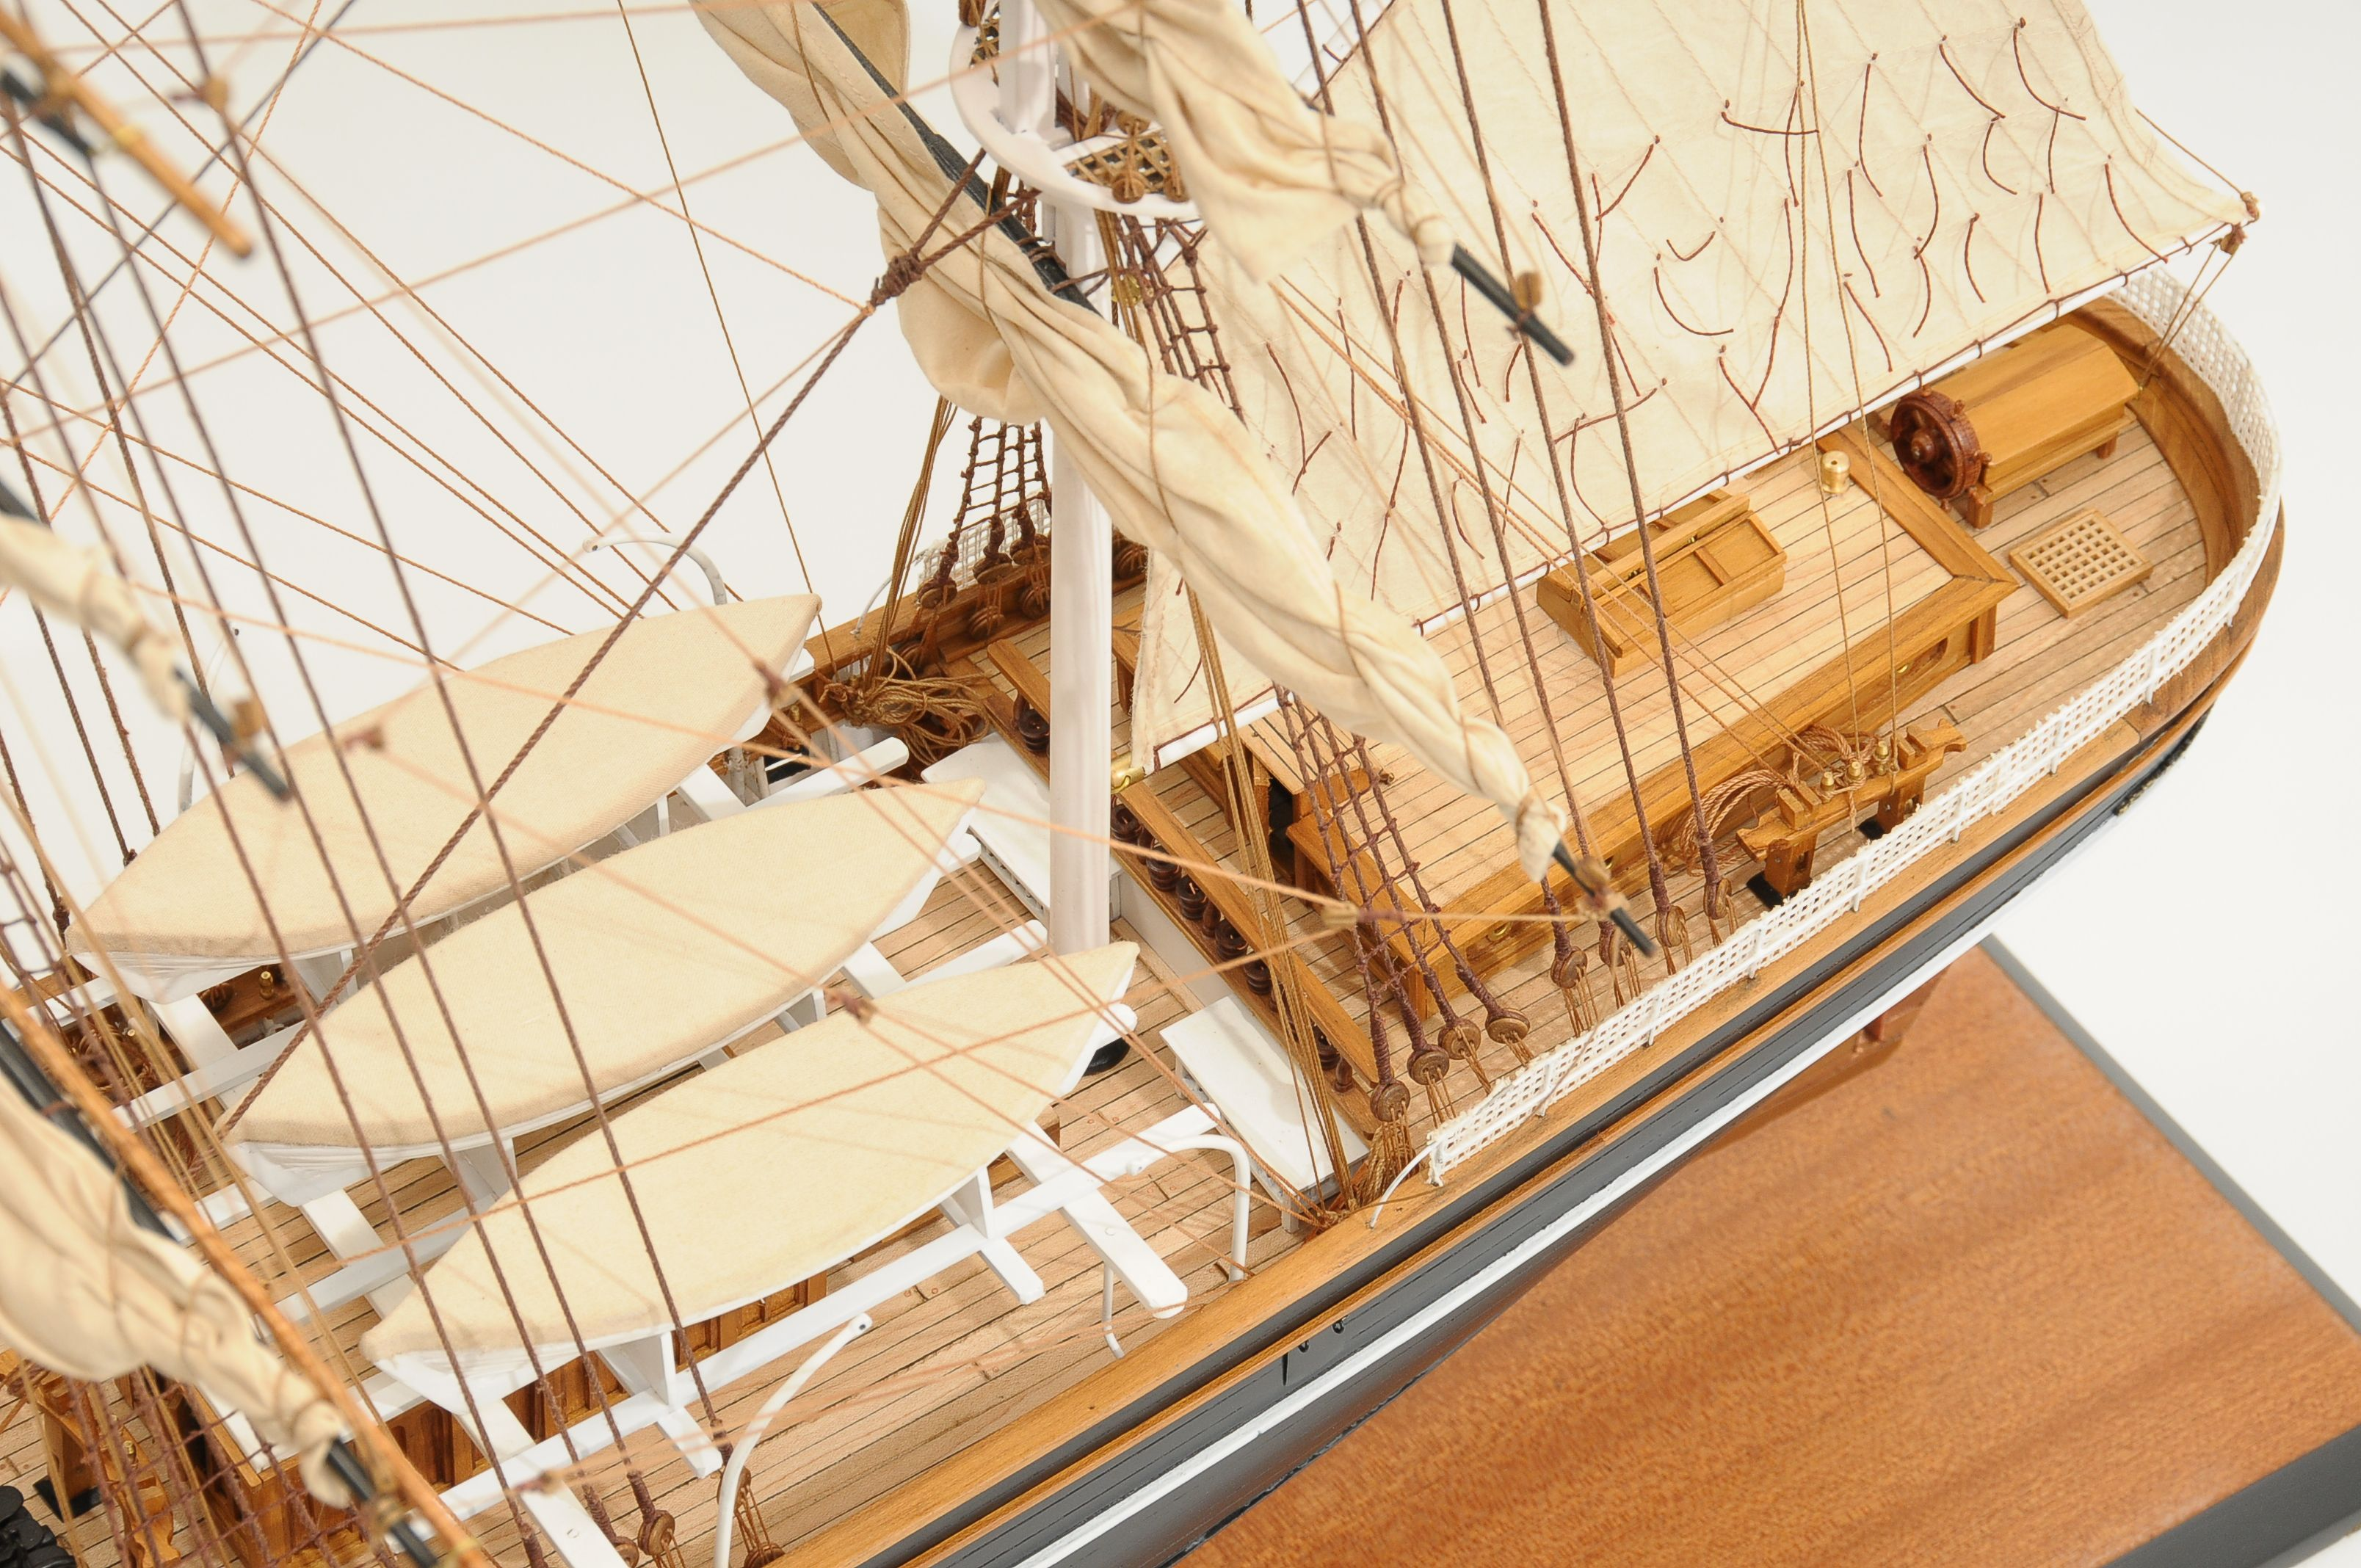 553-8684-Cutty-Sark-model-ship-Premier-Range